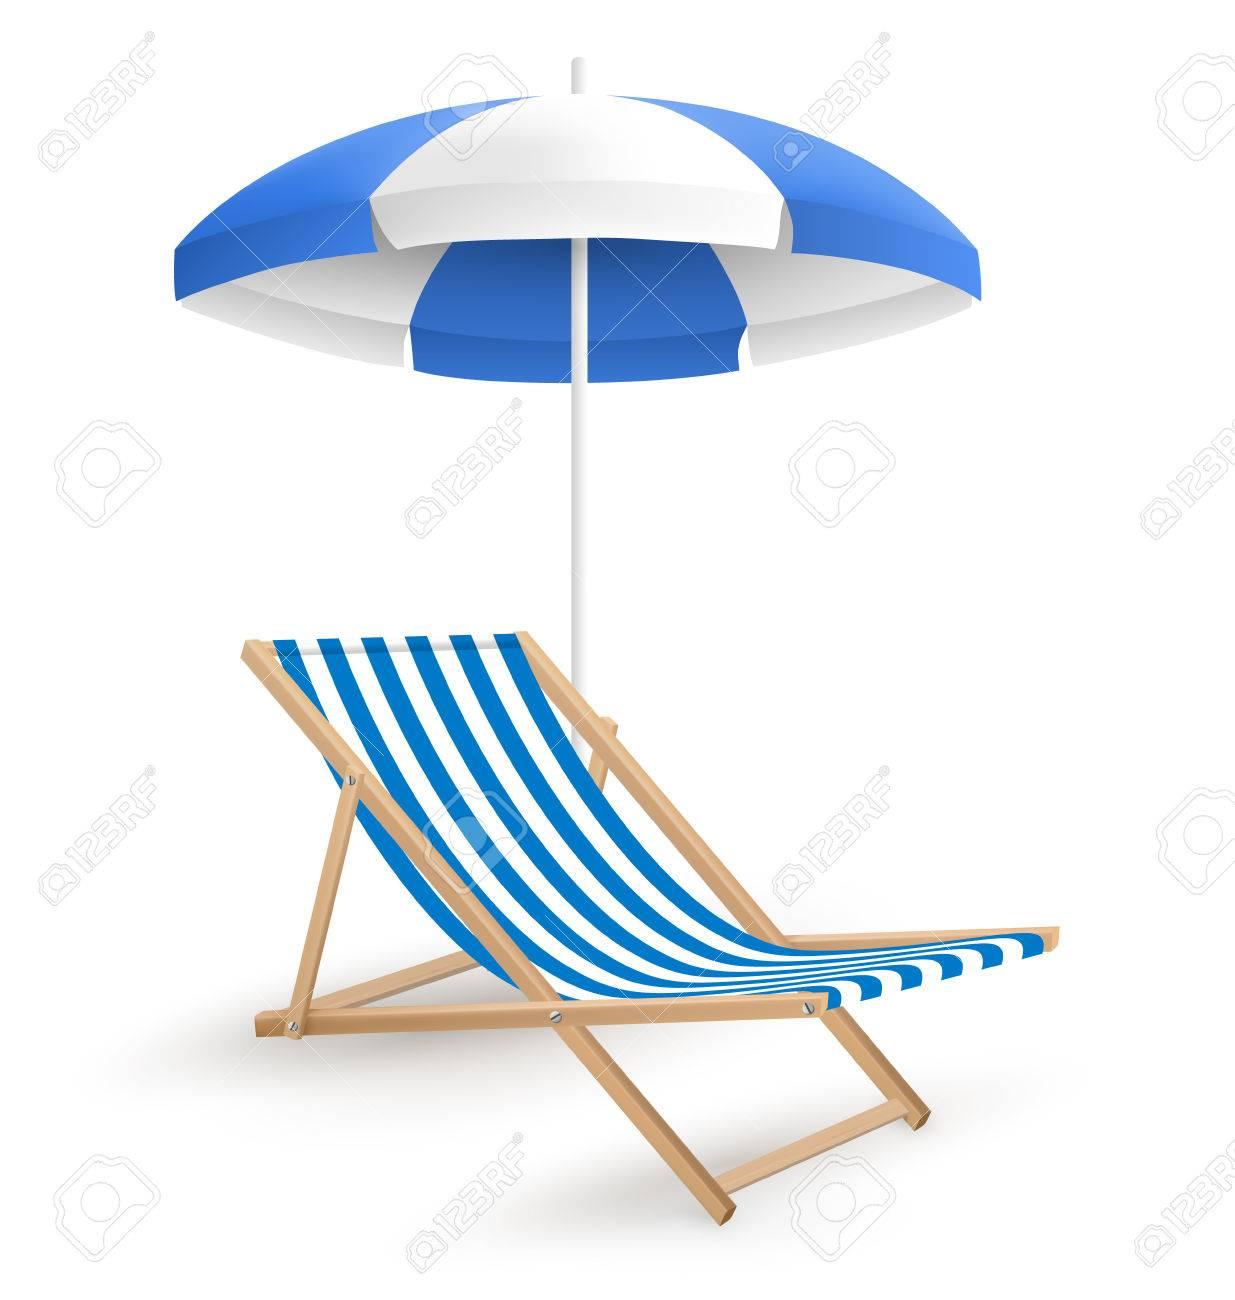 Beach umbrella and chair - Sun Beach Umbrella With Beach Chair Isolated On White Background Stock Vector 41035096